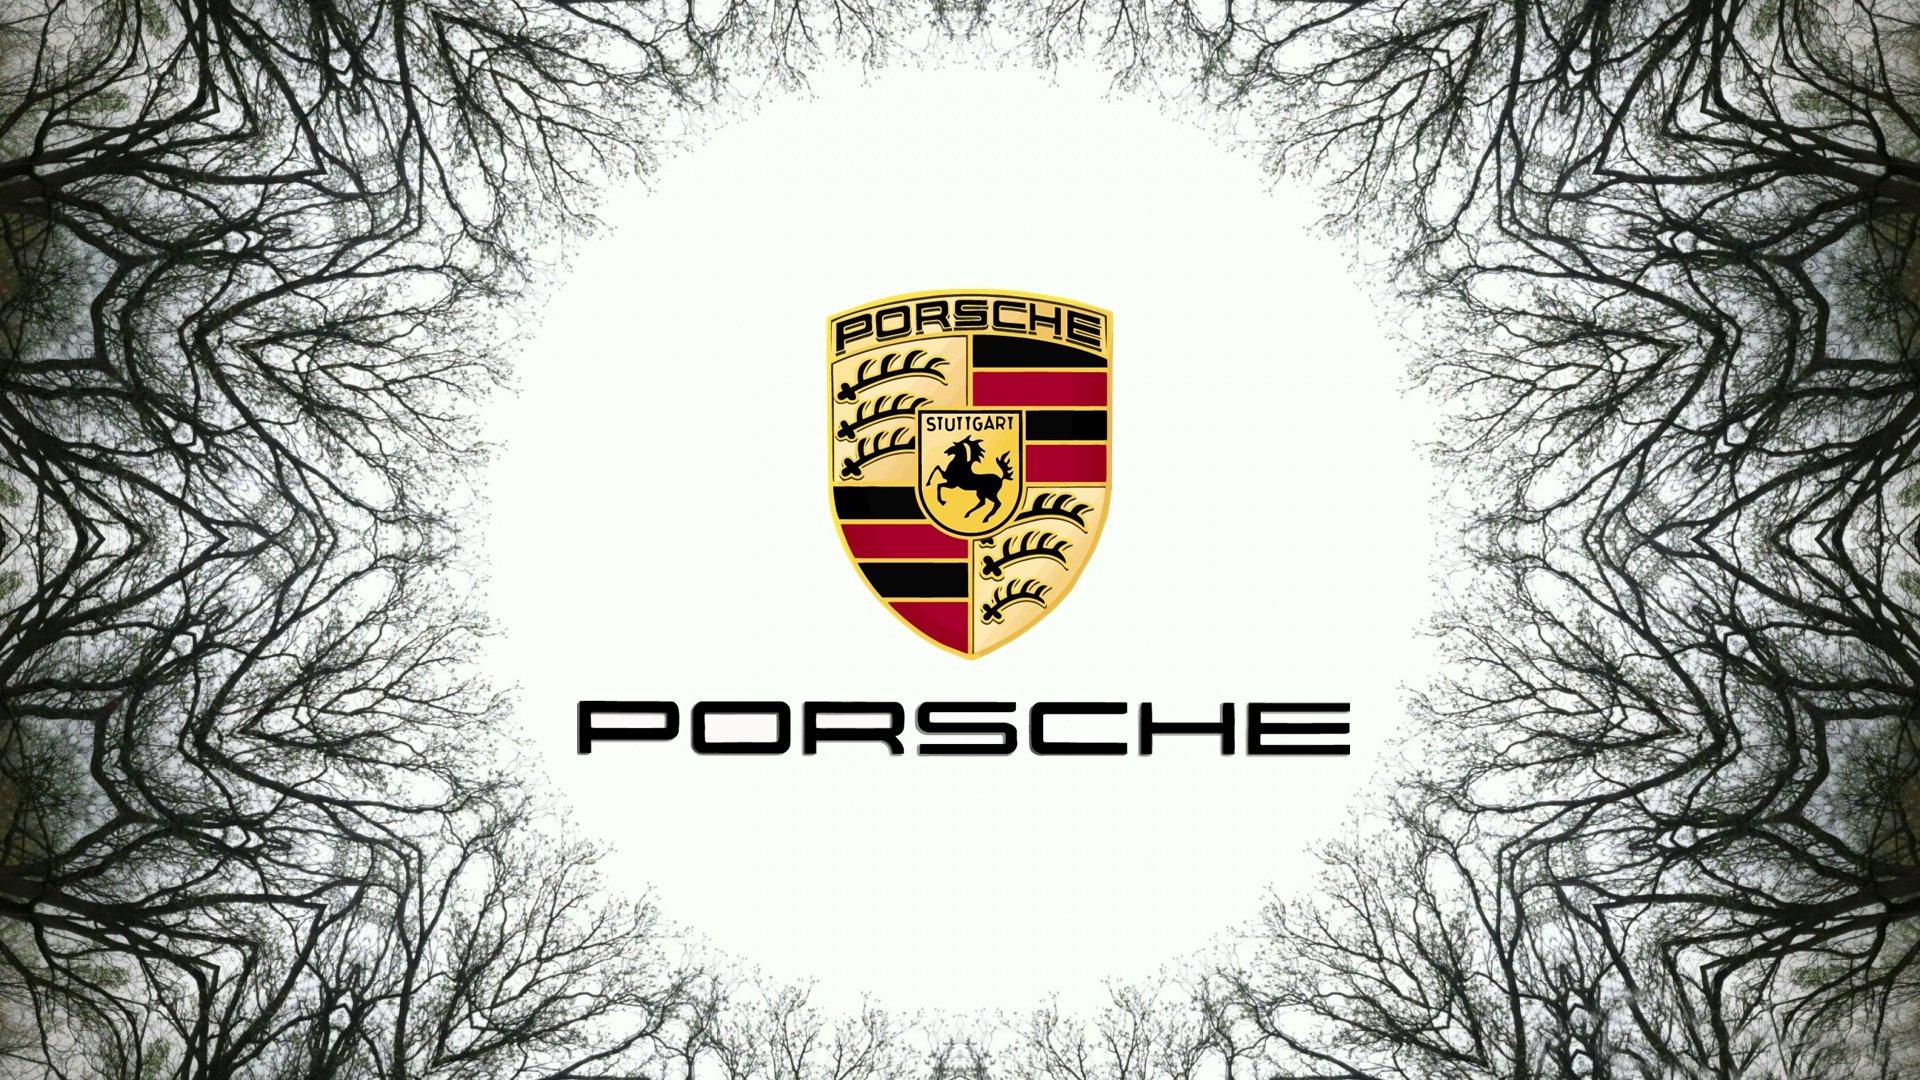 97 Porsche Logo Wallpapers On Wallpapersafari